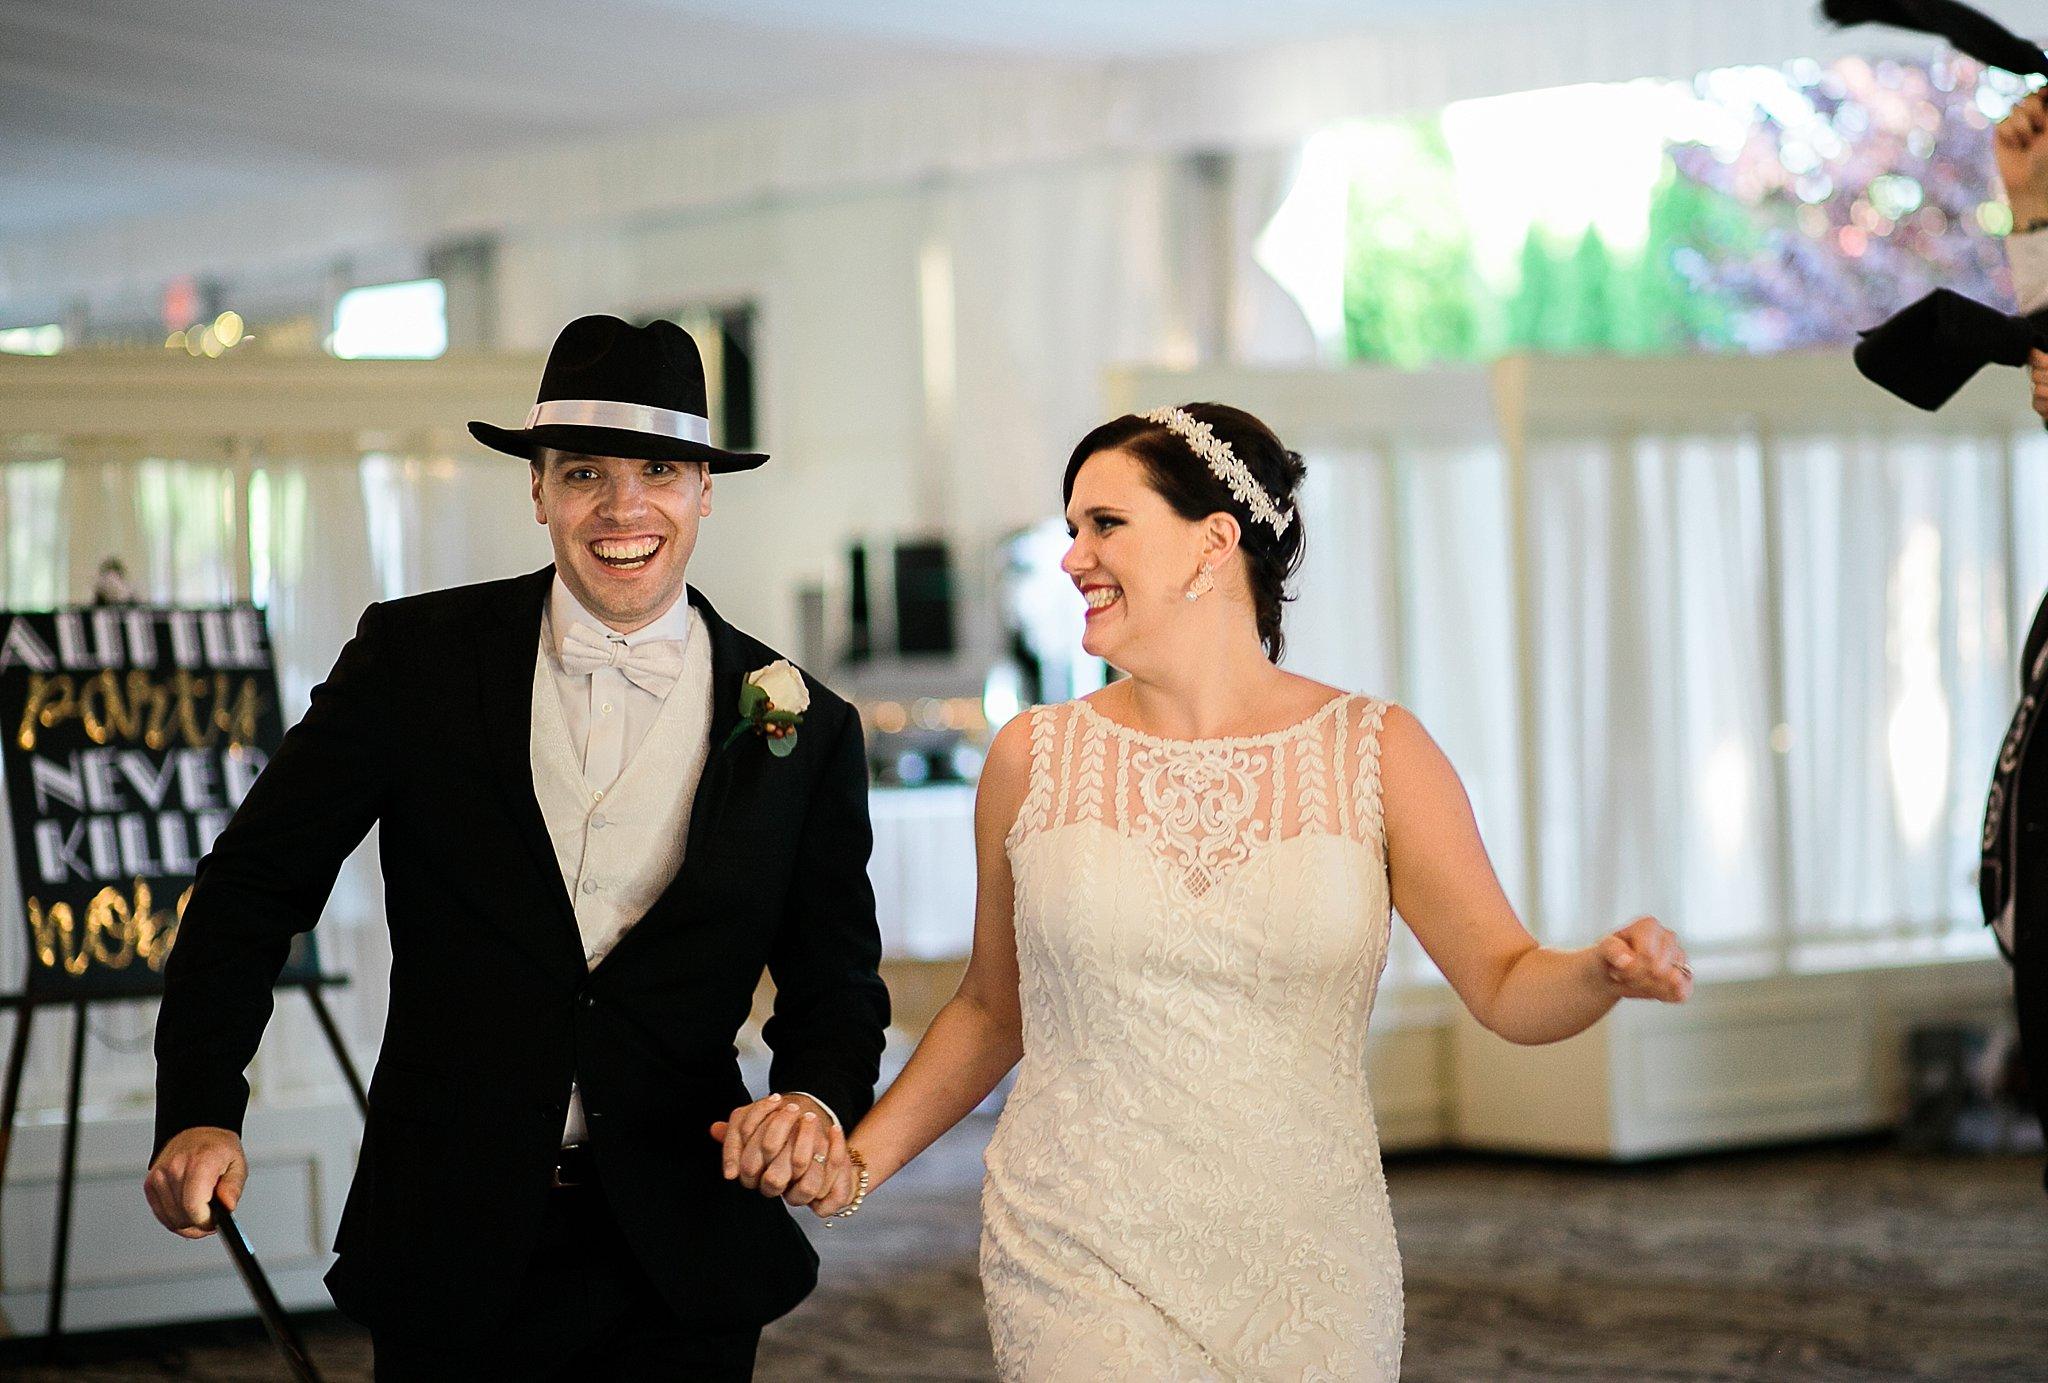 West Hills Country Club Wedding Gatsby Wedding Roaring Twenties Wedding Hudson Valley Wedding Photographer Sweet Alice Photography60.jpg